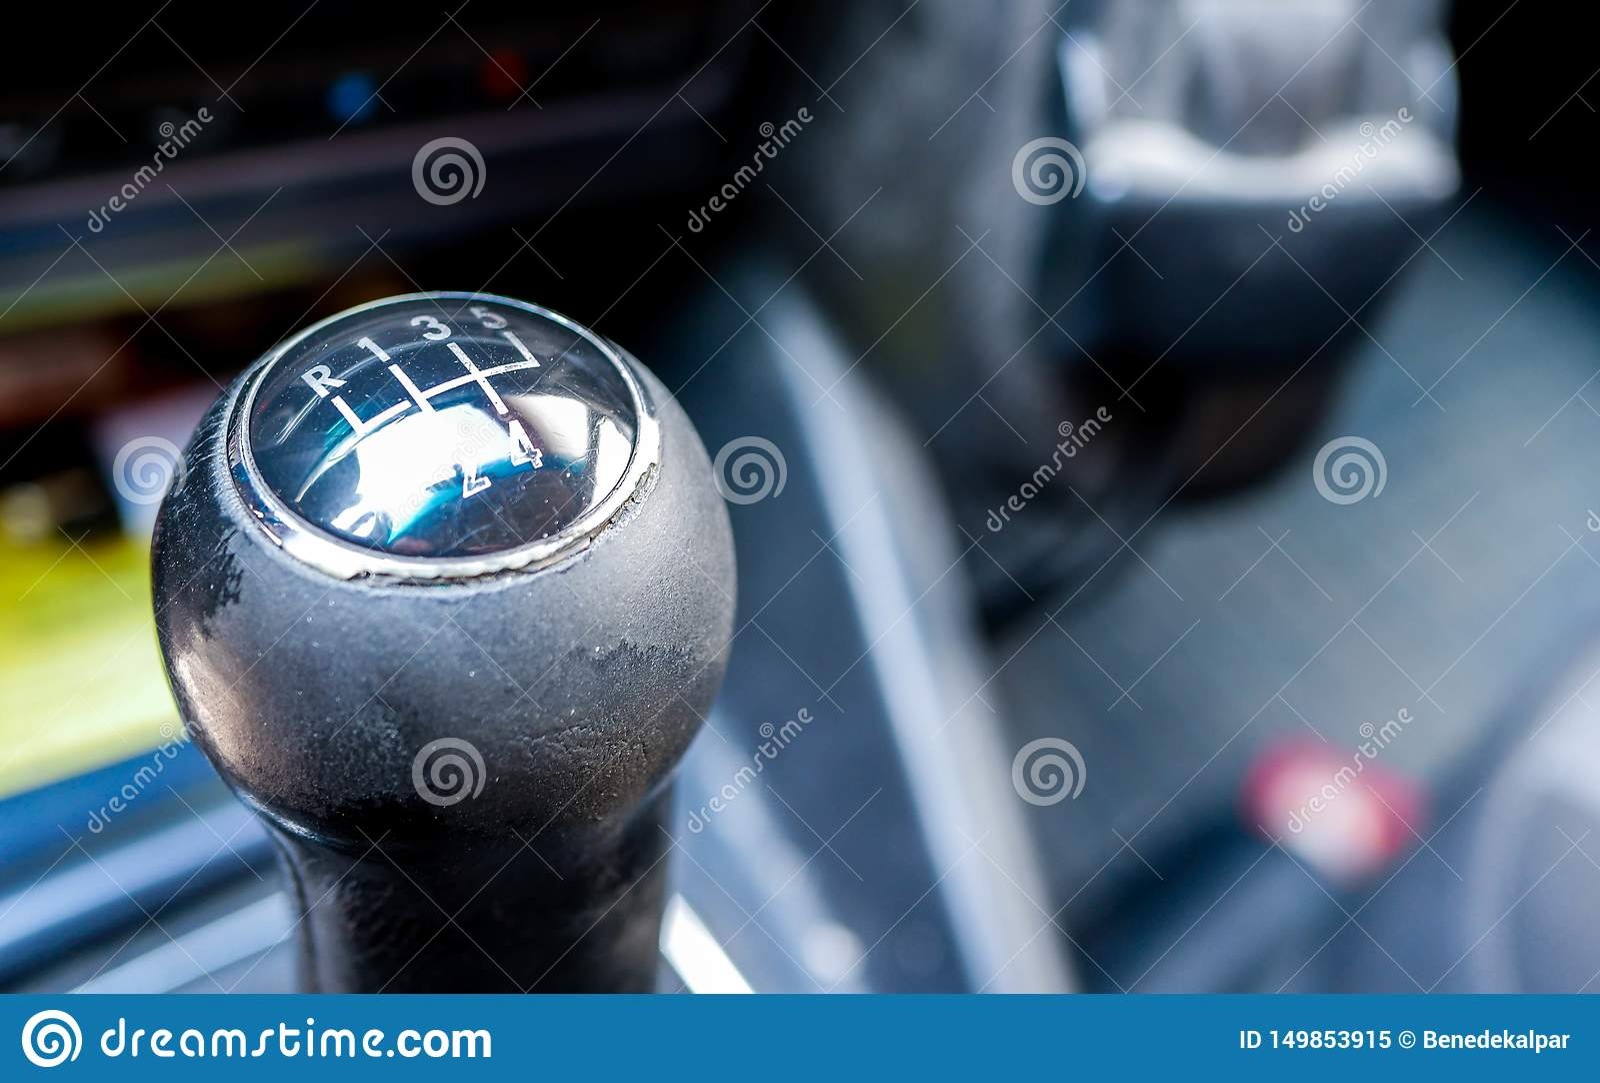 Used, worned gear shift knob close up